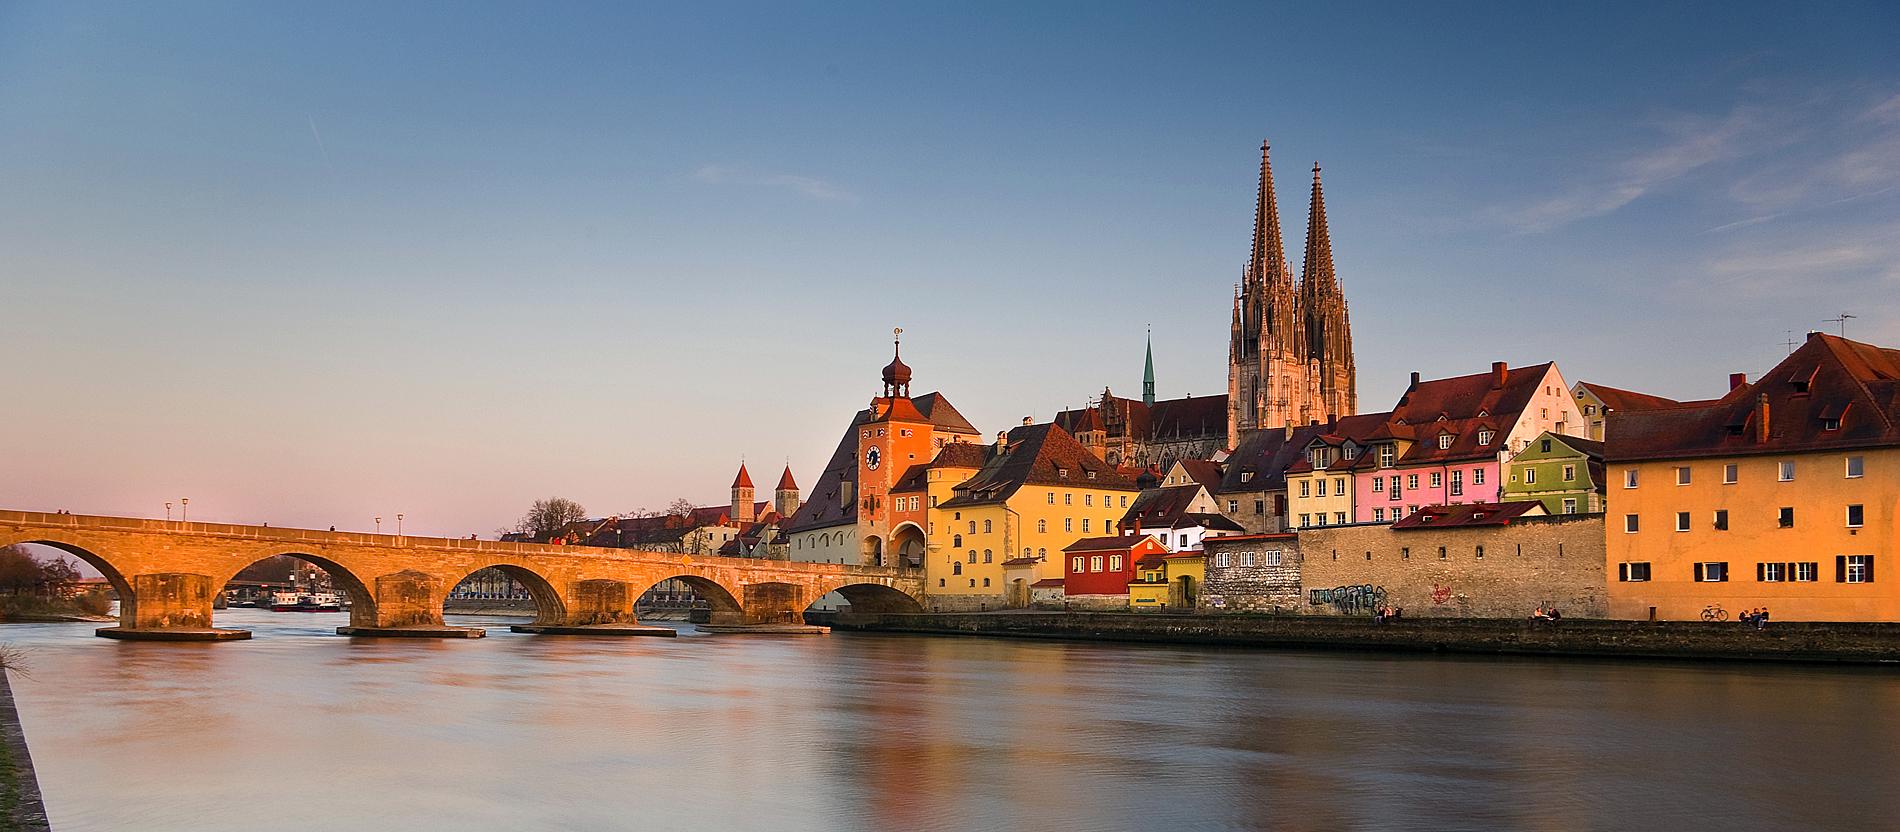 Regensburg Oberbürgermeister